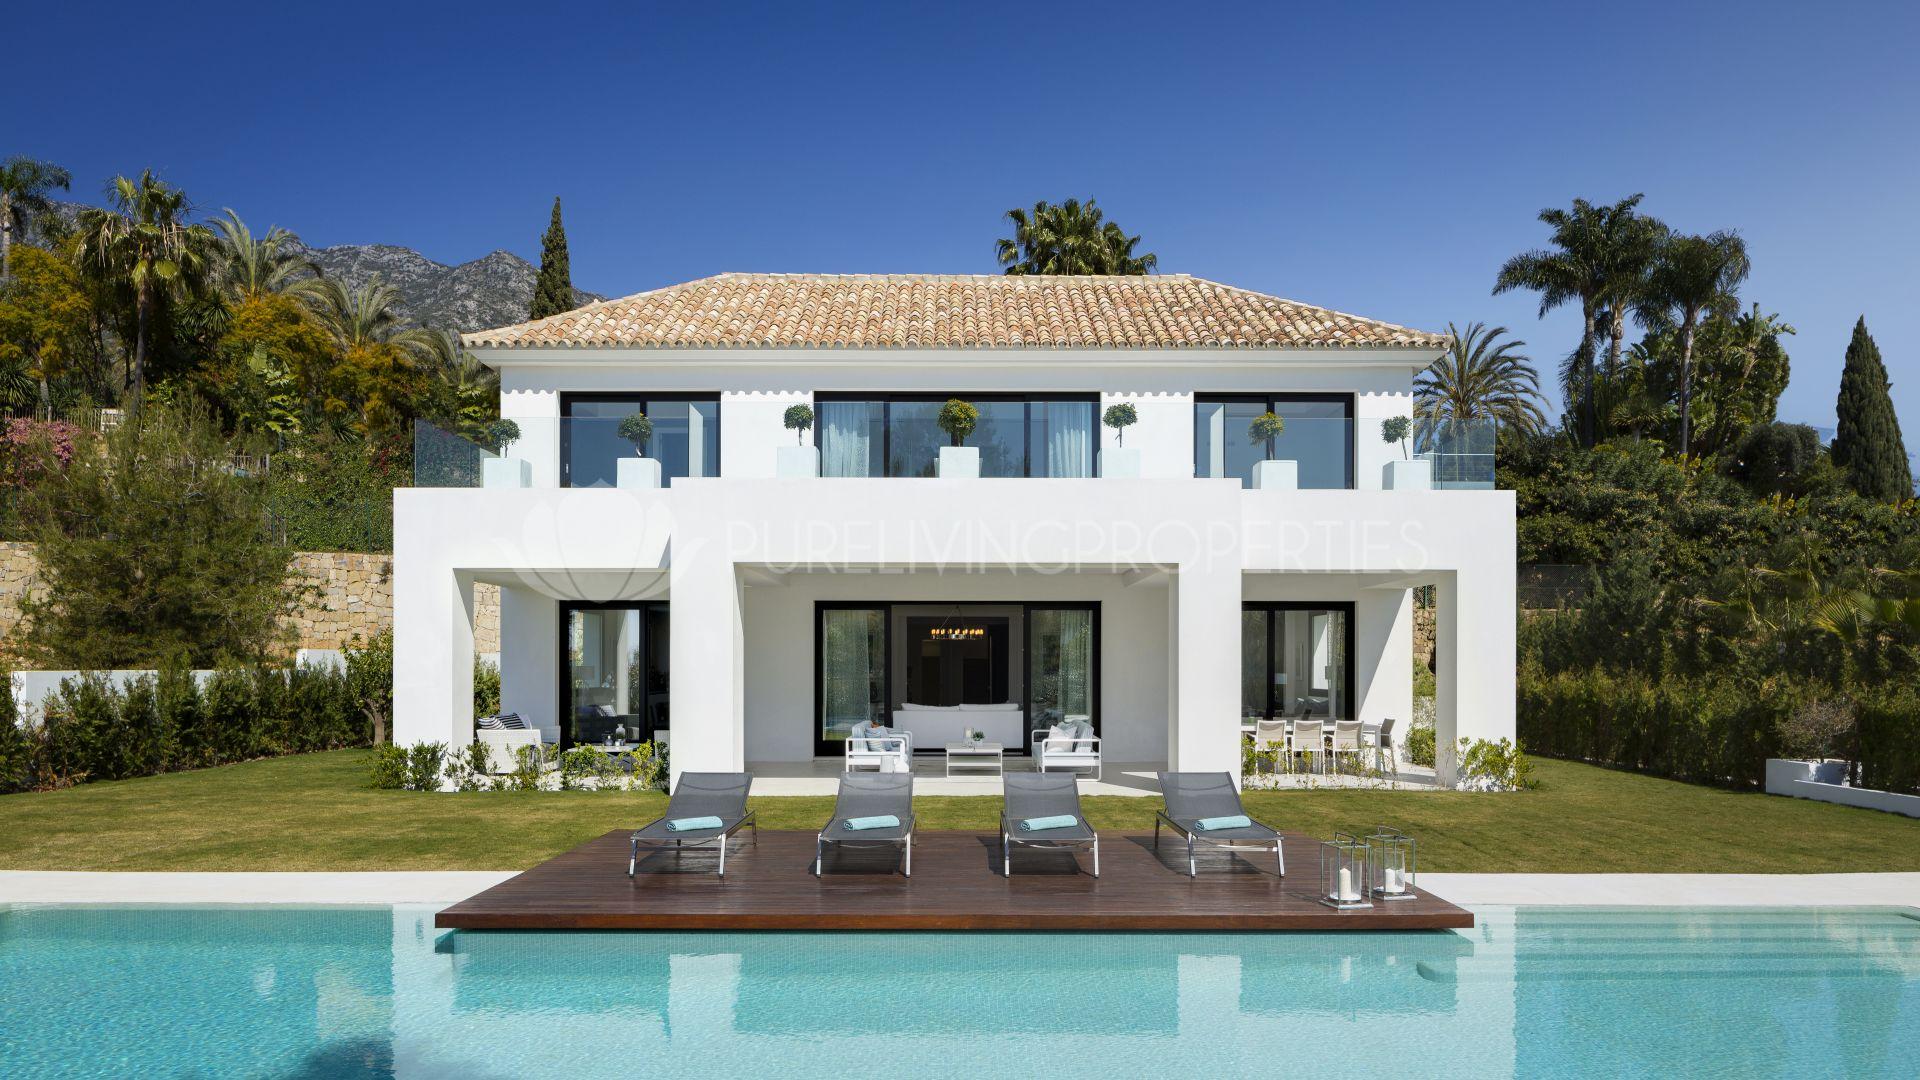 Holiday Villa Spain Rent